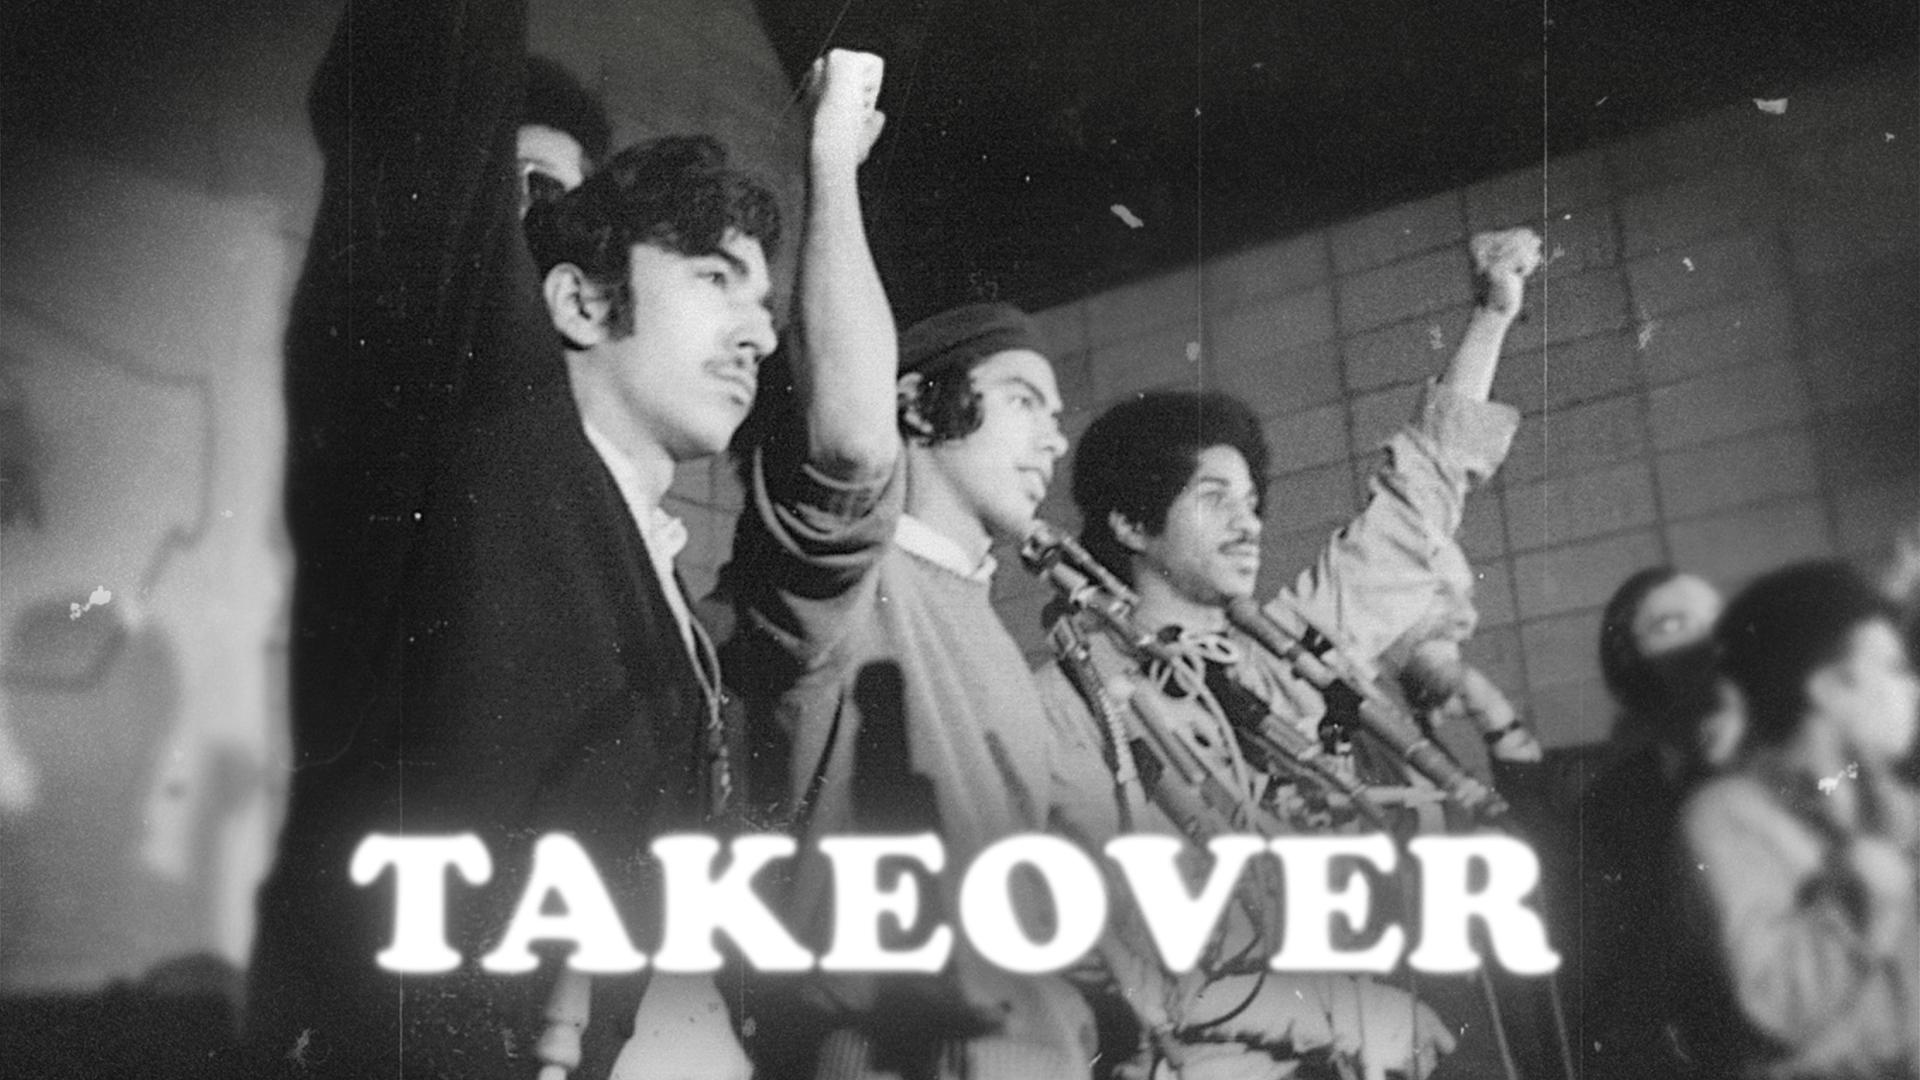 Imagen del cartel del filme Takeover